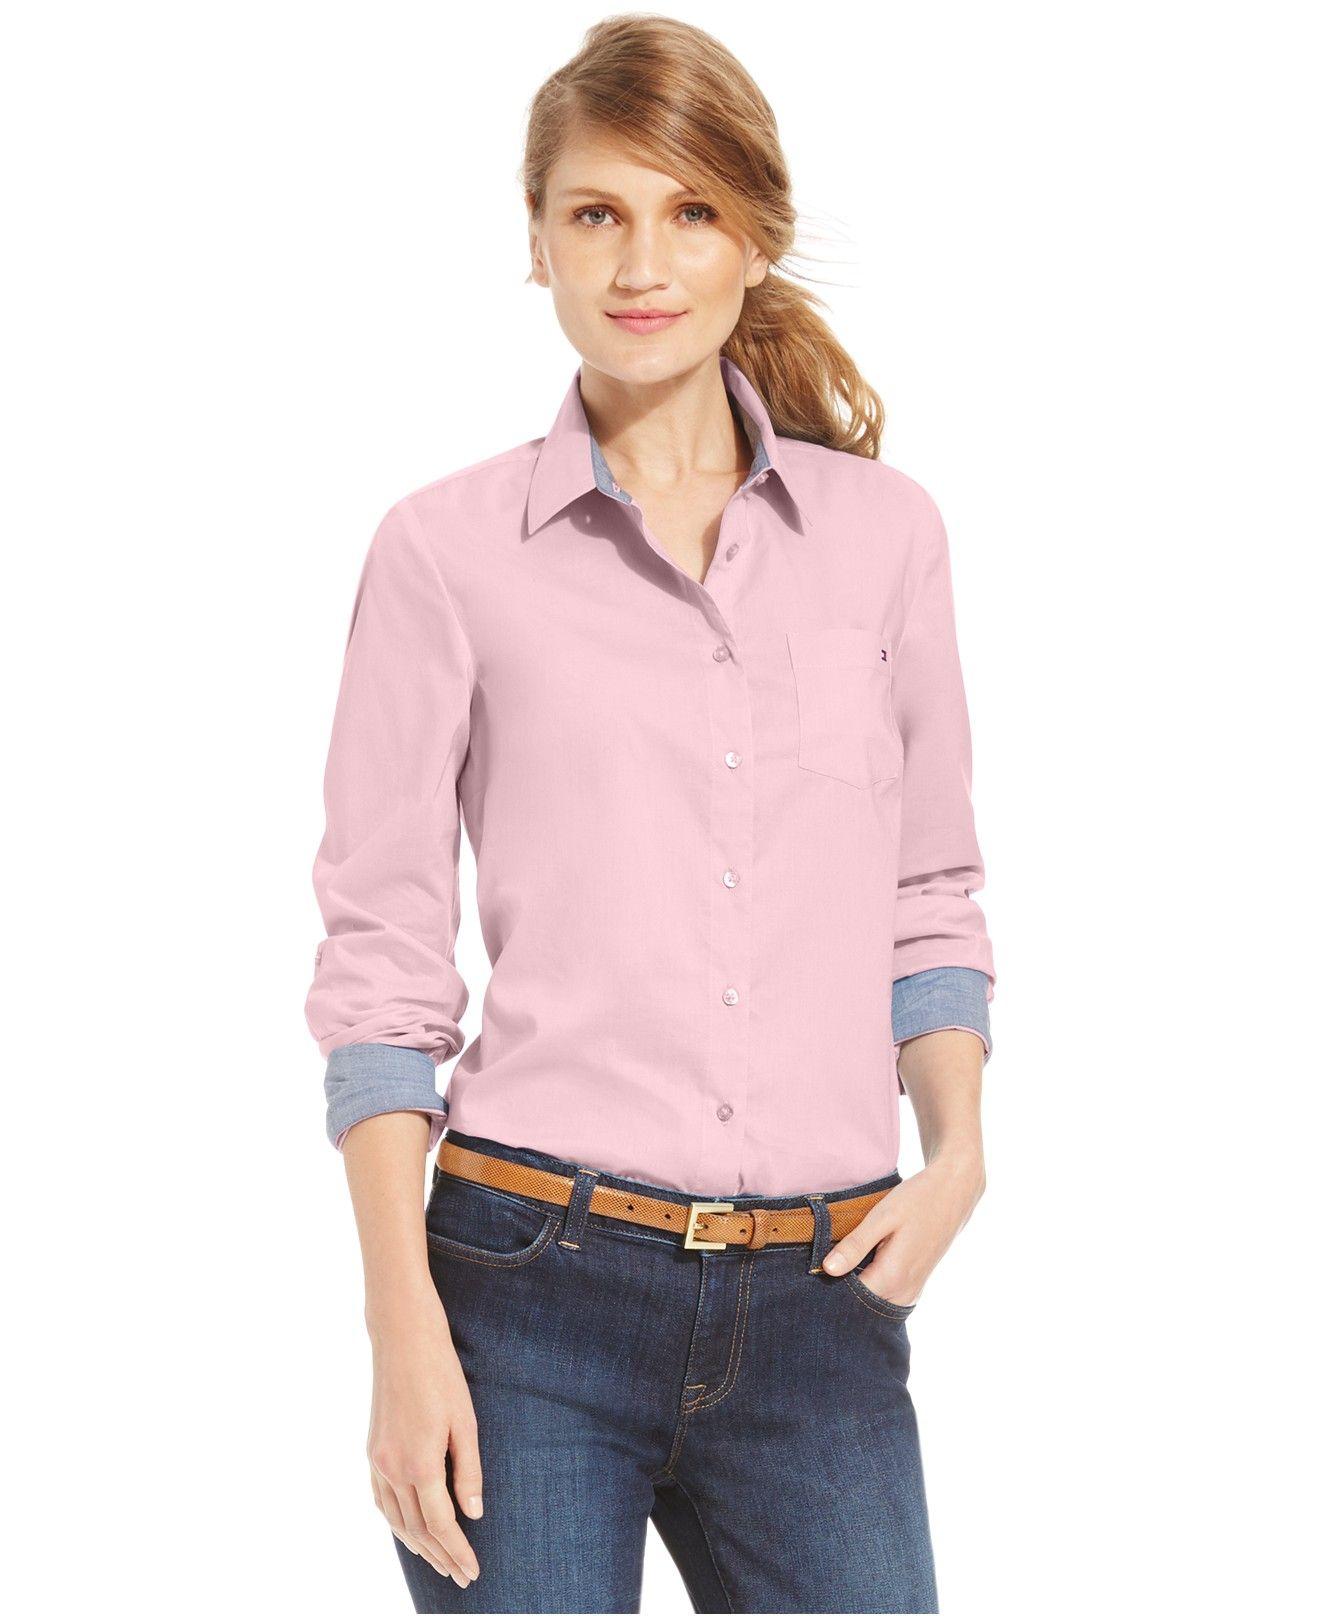 23d7f058dd233 Tommy Hilfiger Solid Button-Down Shirt - Tops - Women - Macy s ...